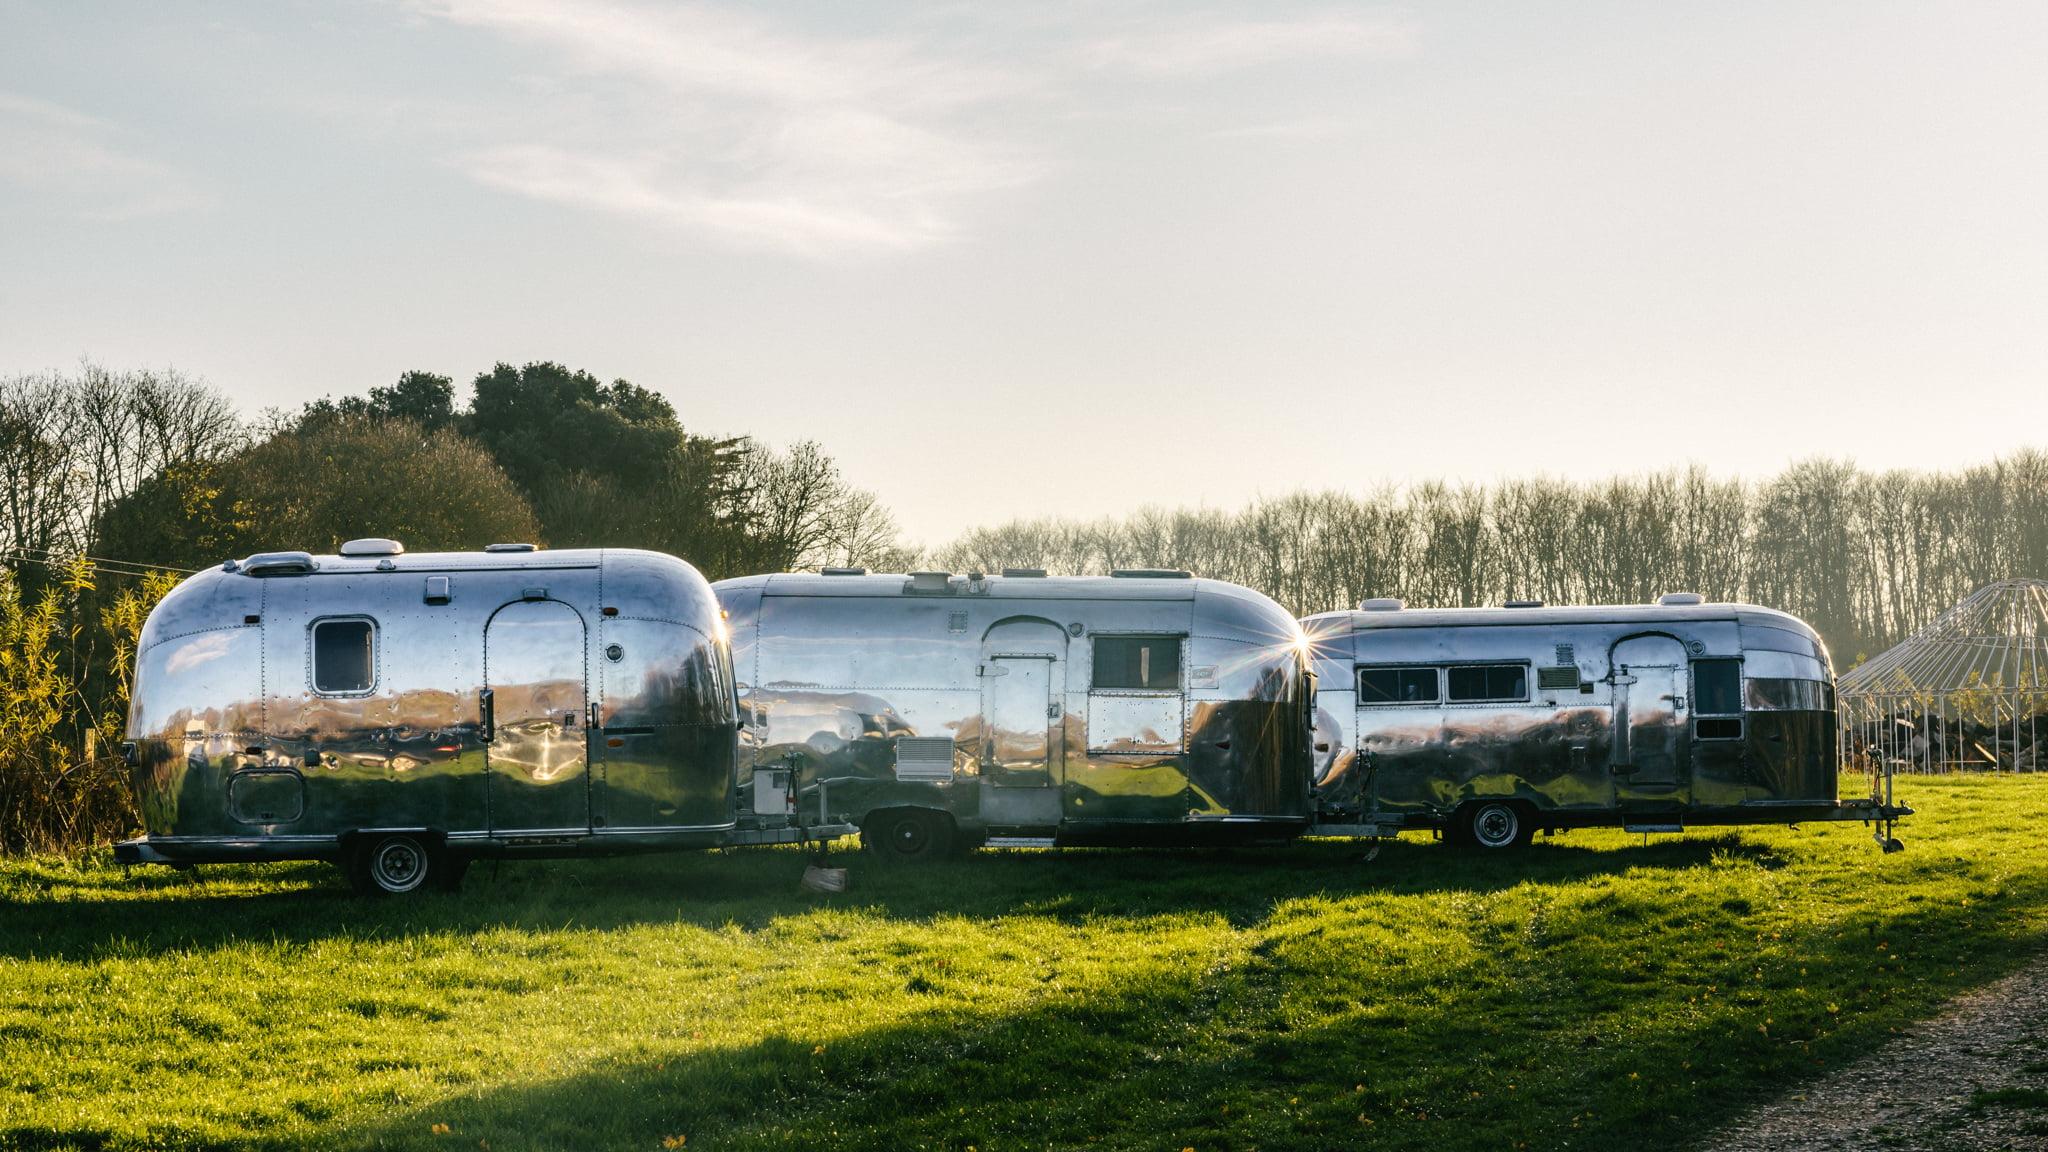 Airstream Fleet Plush Tents Glamping